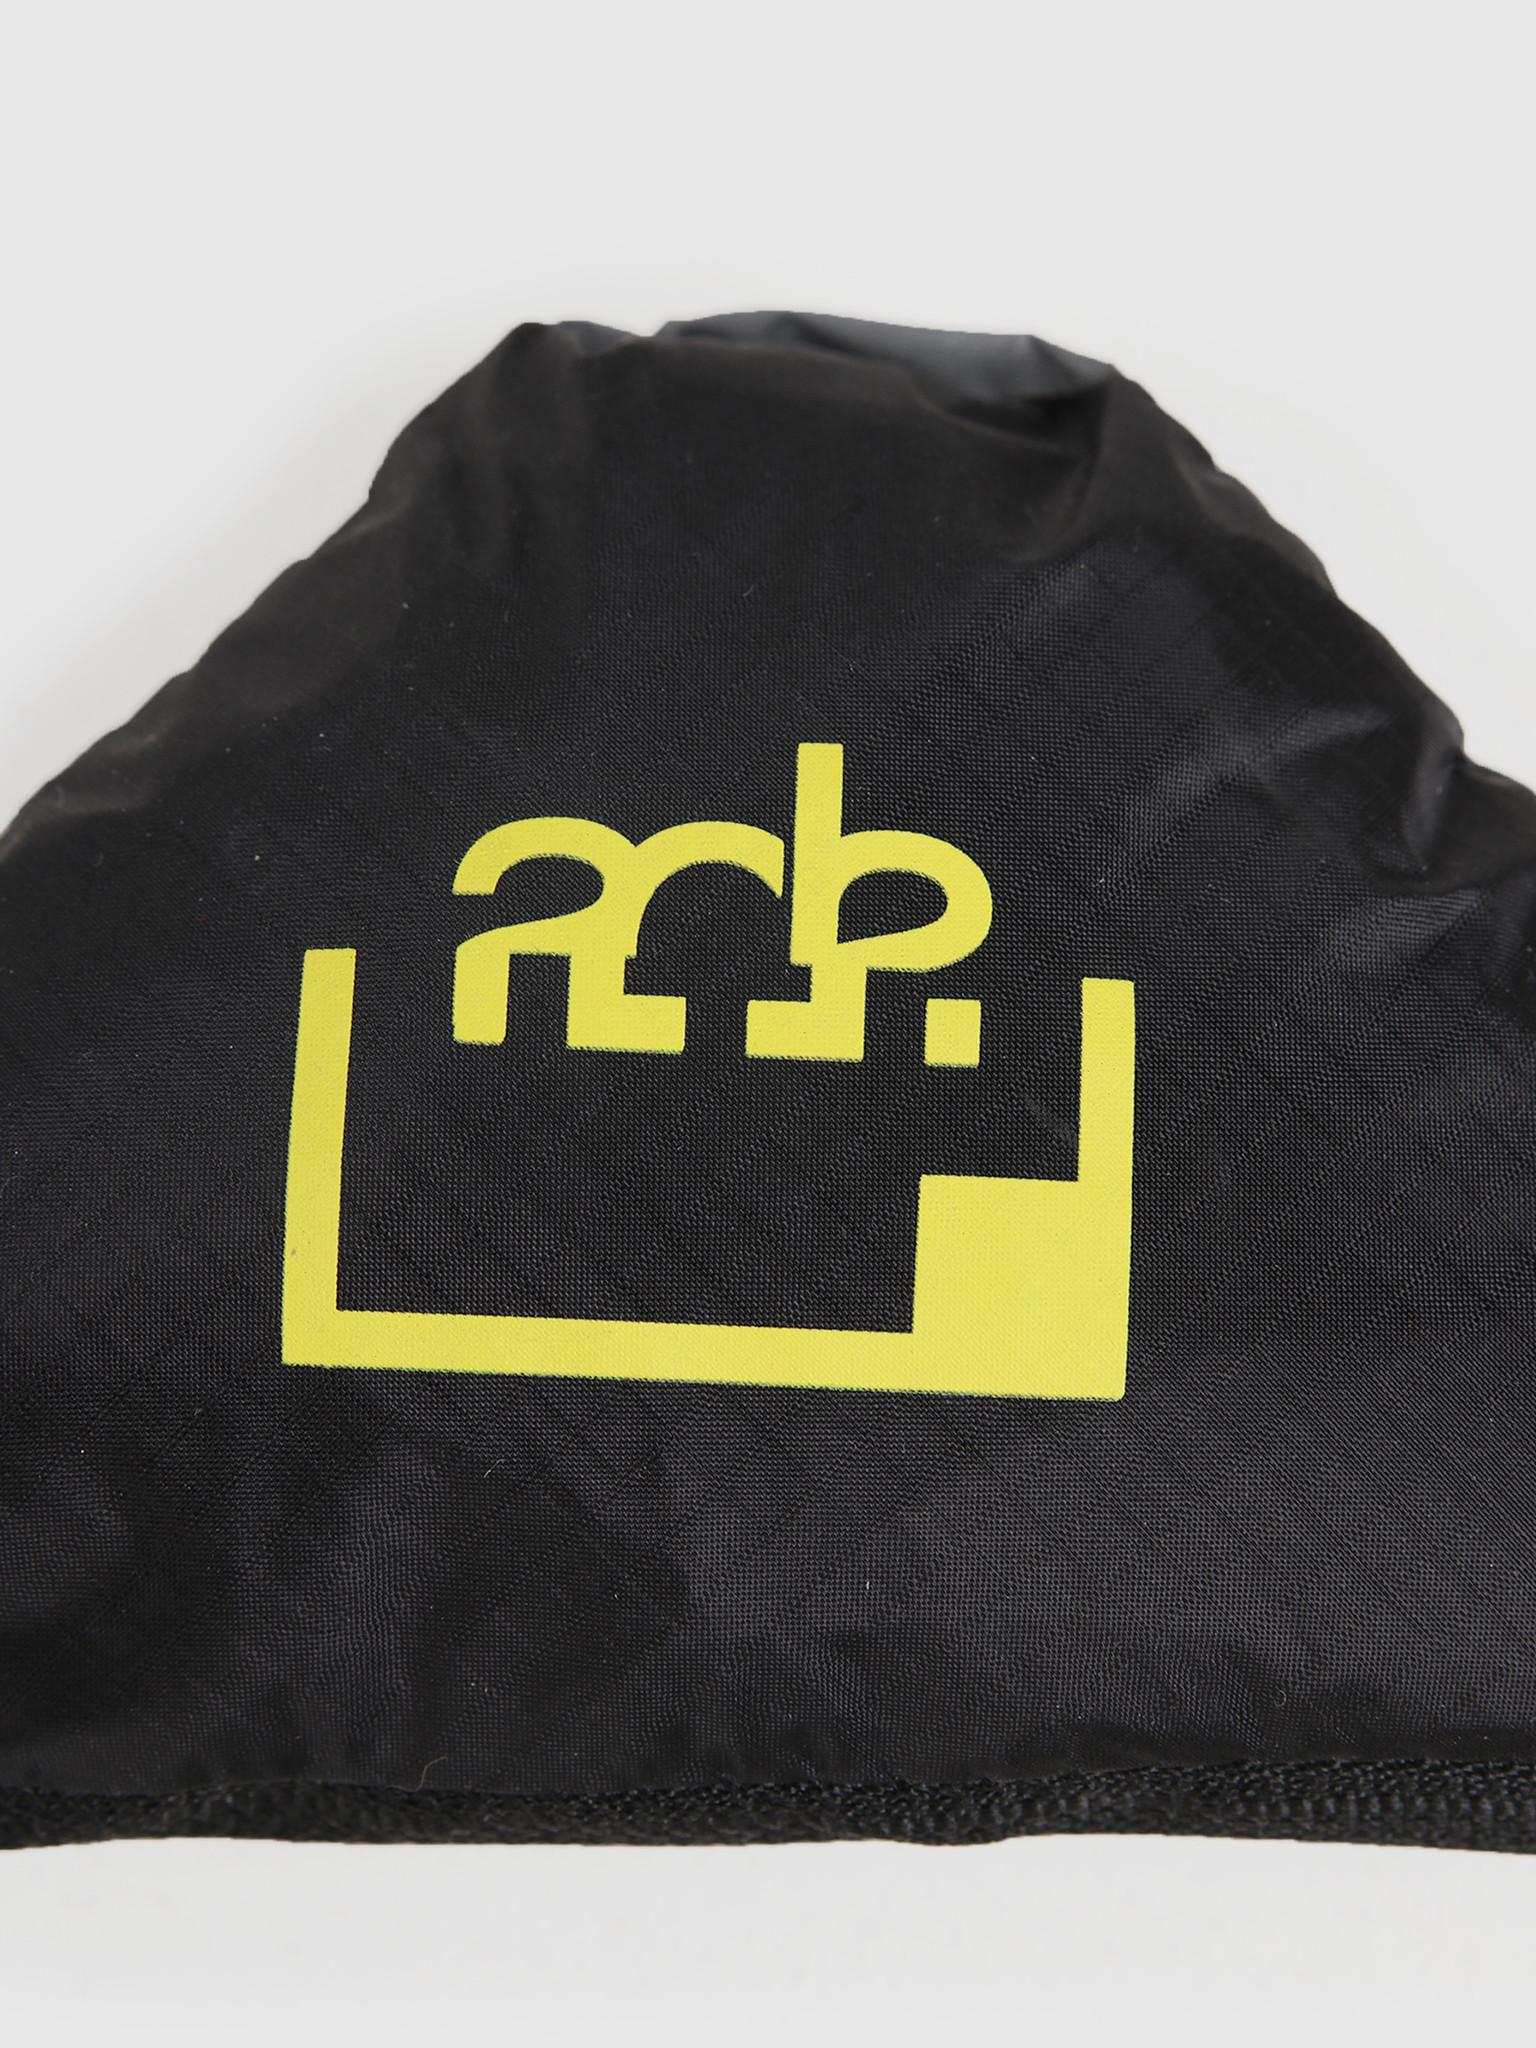 FRESHCOTTON x ADE FRESHCOTTON x ADE Packable Ripstop Tote Bag Black